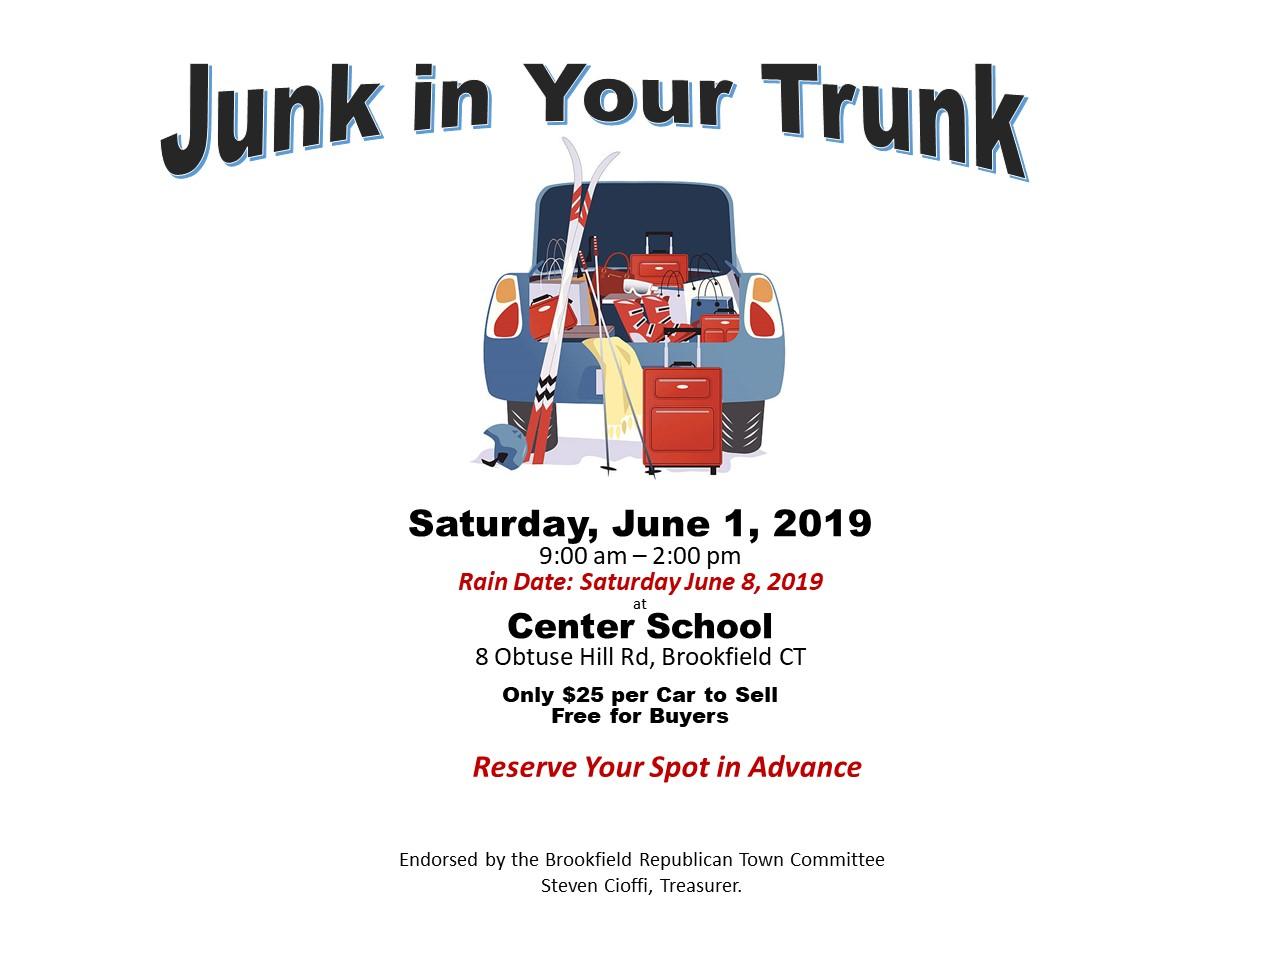 Trunk Junk Event